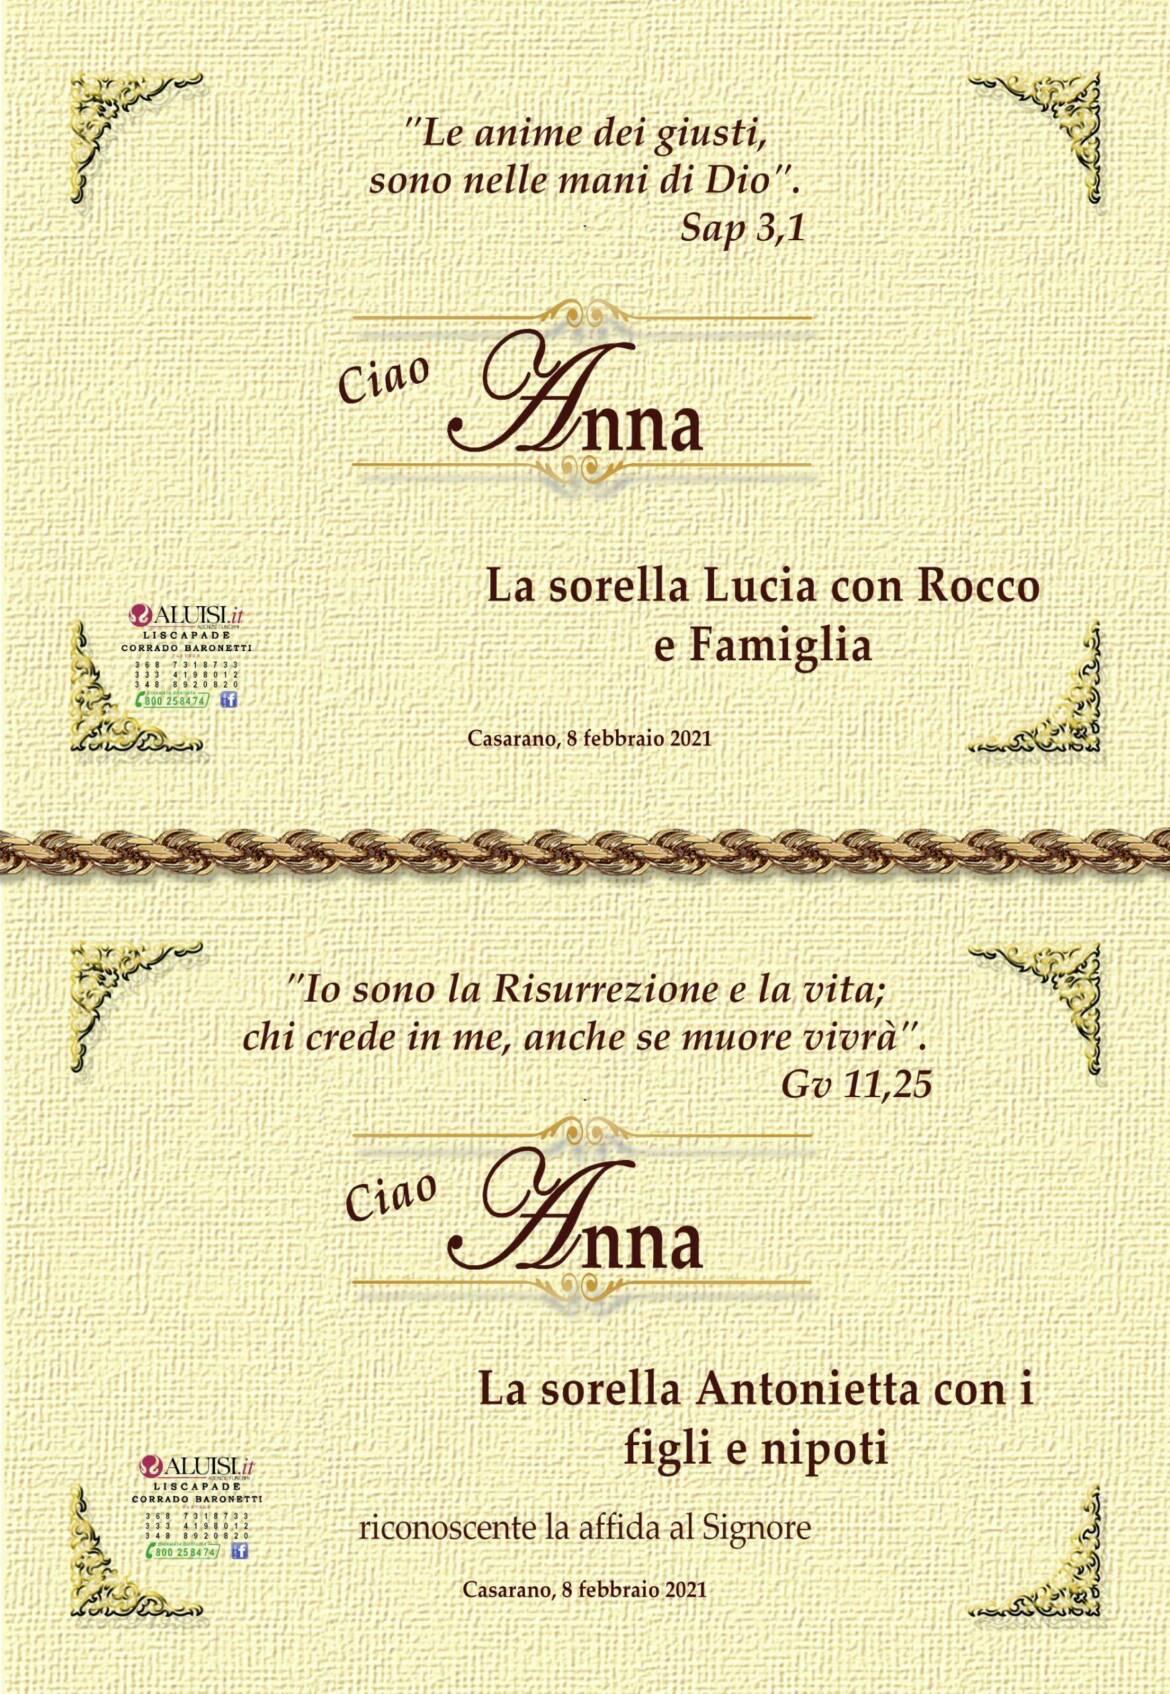 partecipazione-annamaria2-1-scaled.jpg